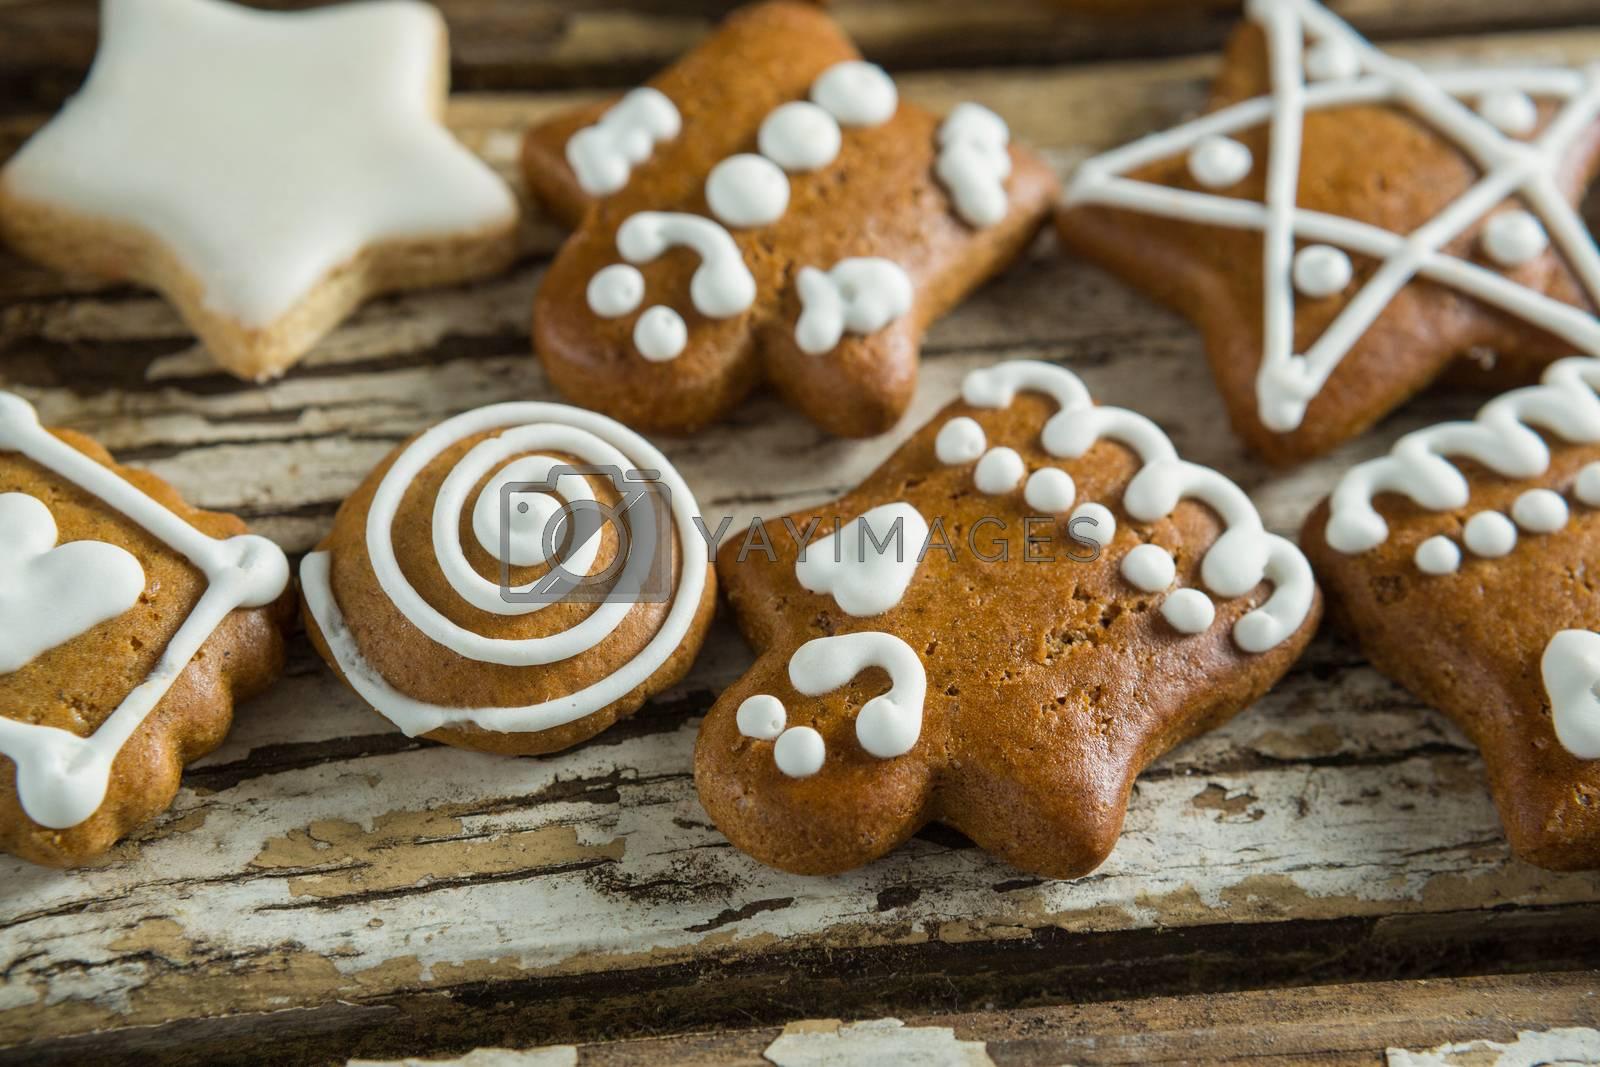 Gingerbread cookies arranged on wooden plank by Wavebreakmedia